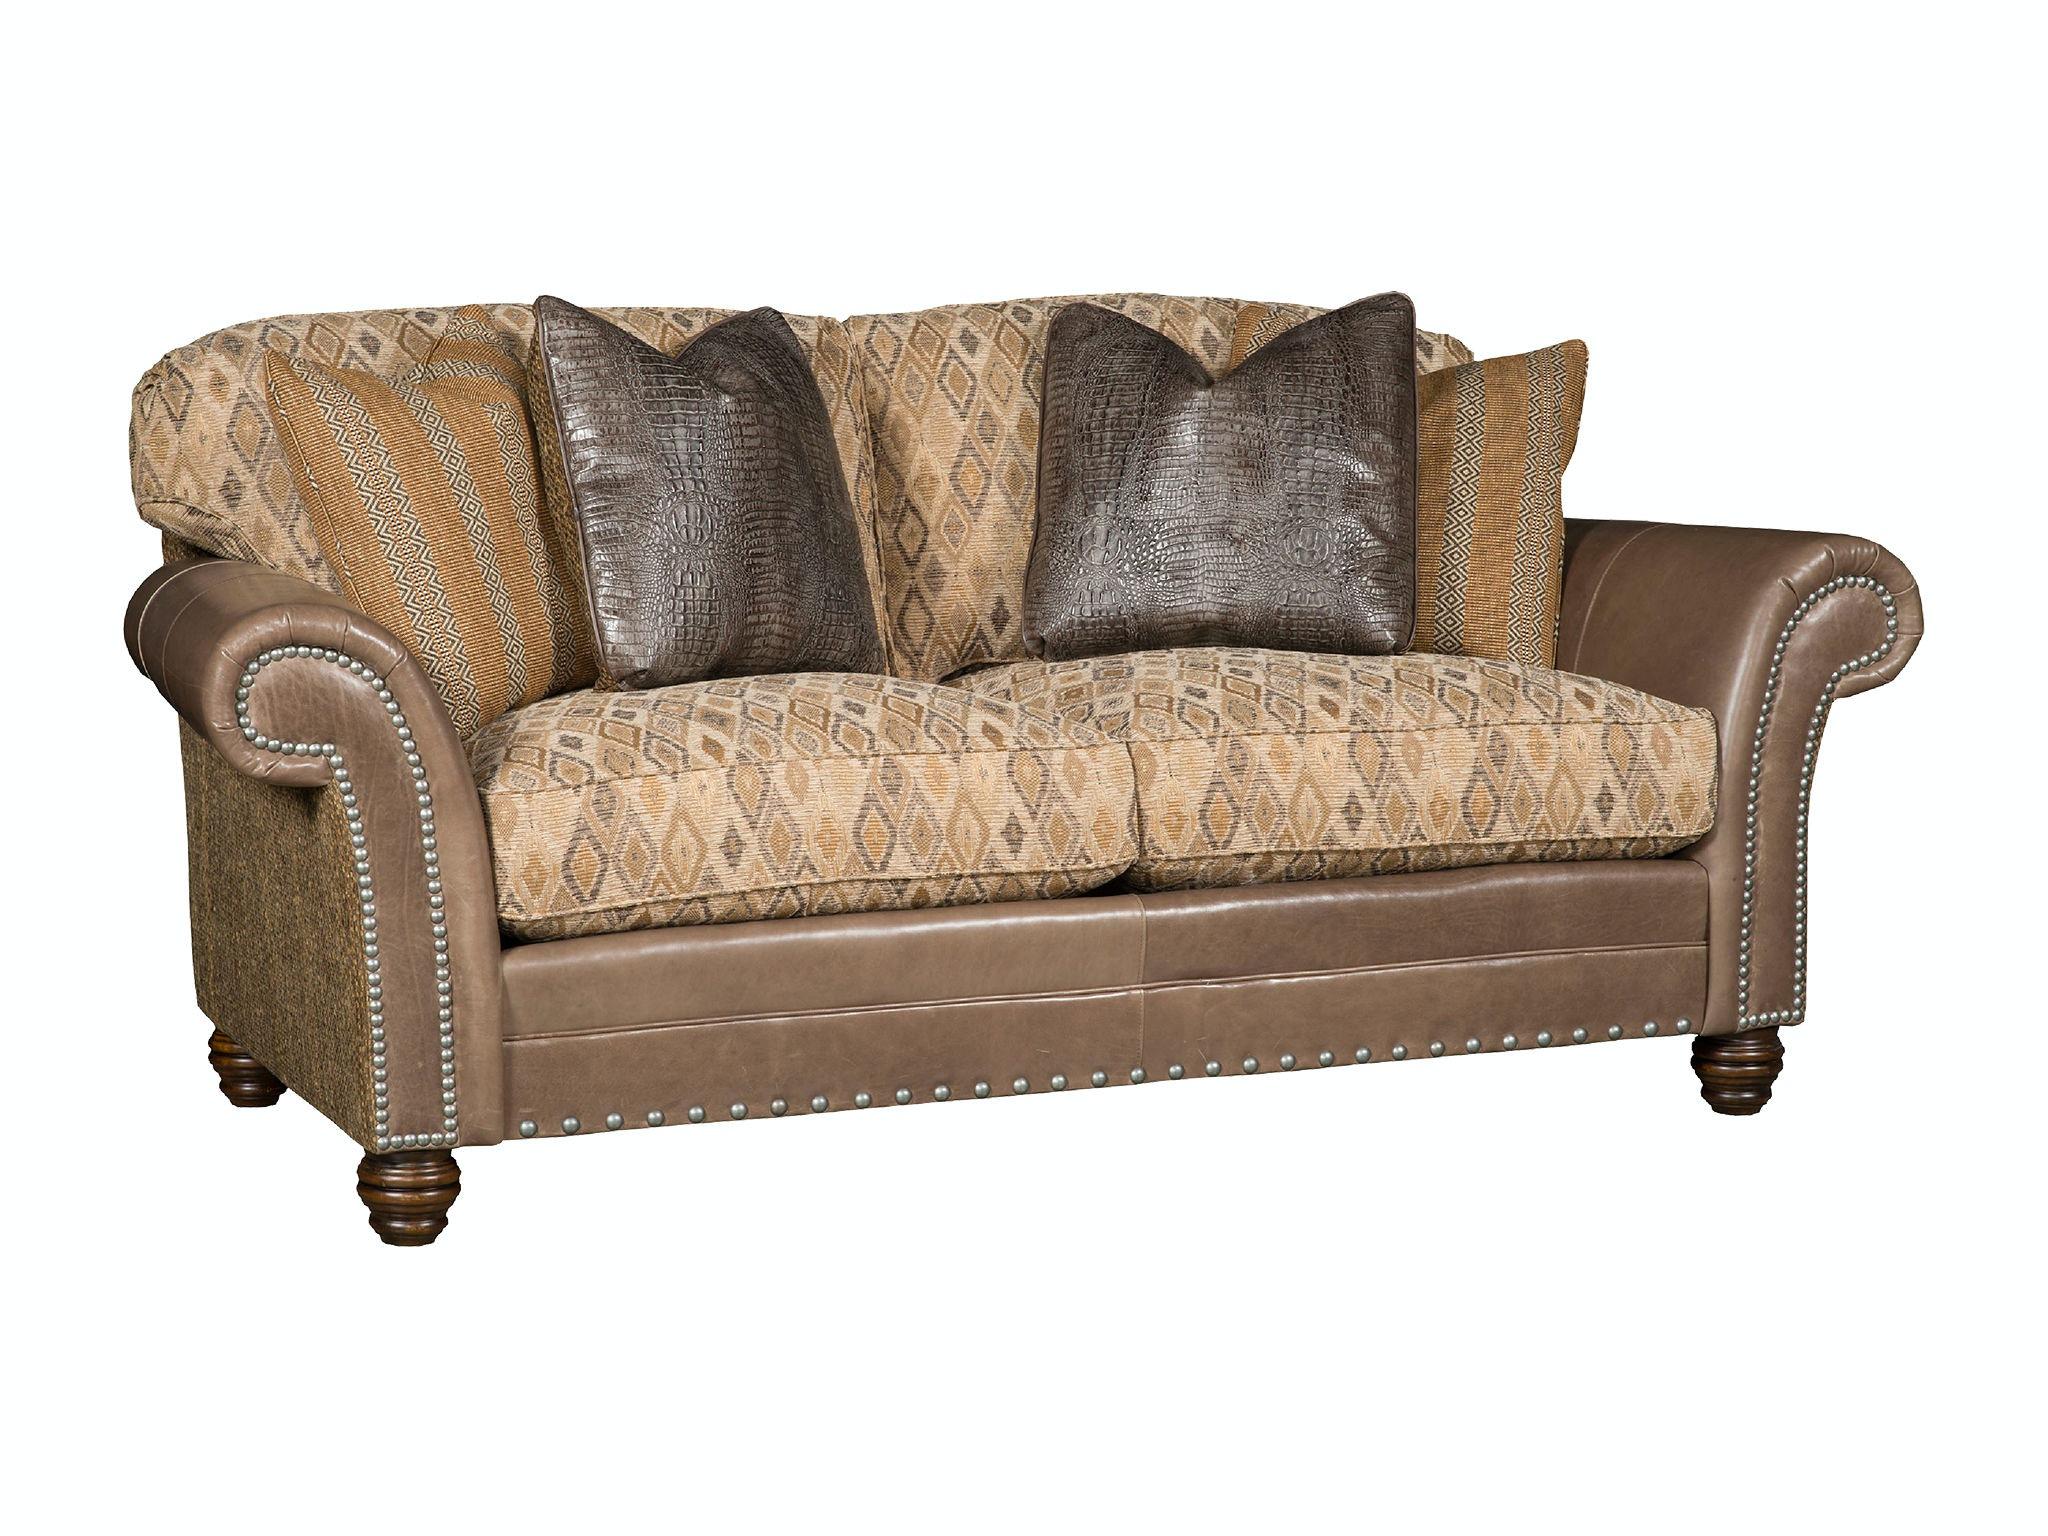 King Hickory Katherine Leather/Fabric Sofa 9700 LF